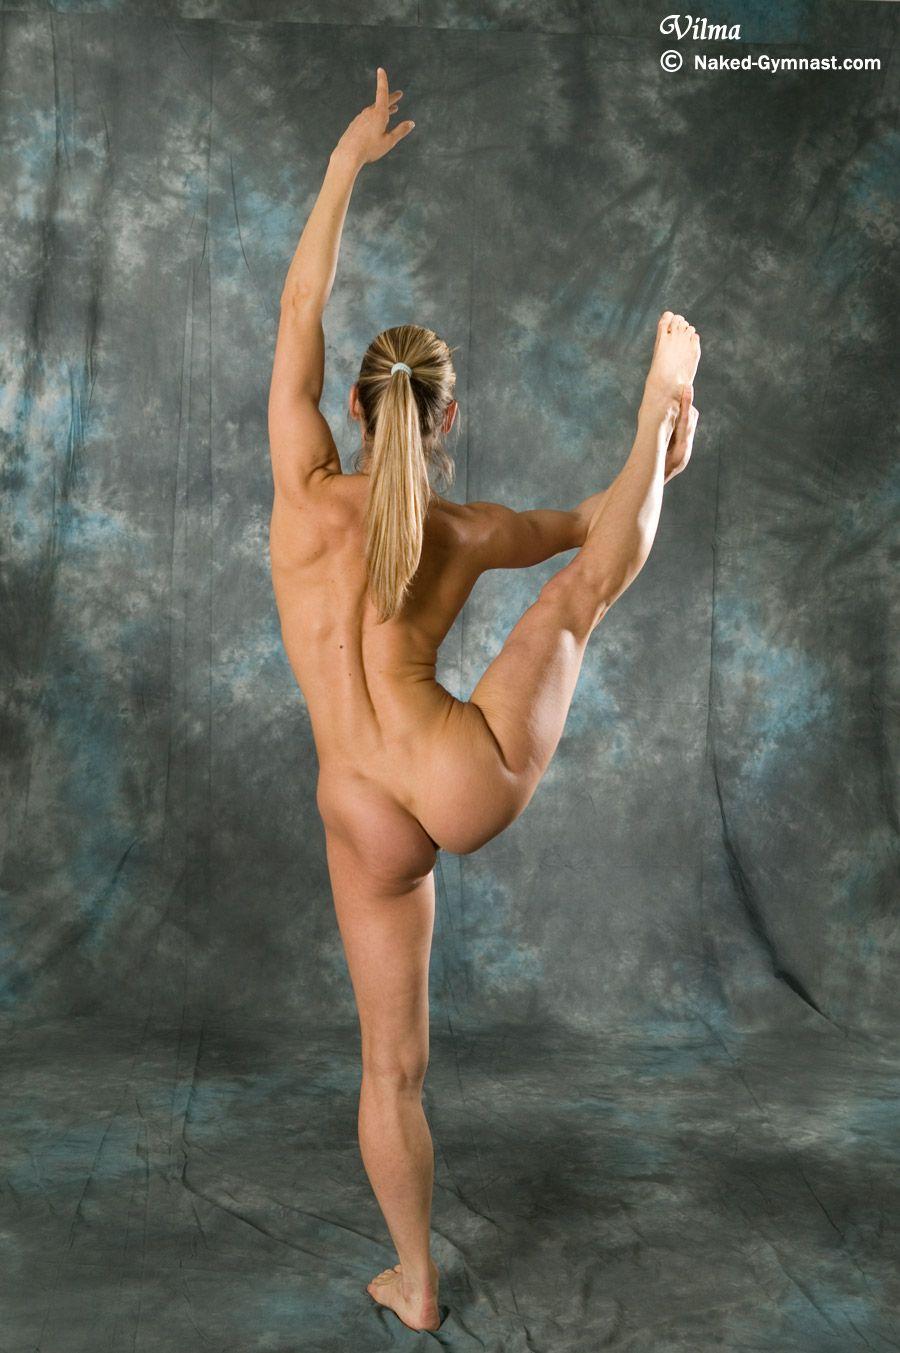 Gymnast Nude in naked gymnast vilma picture 9   referencias de pose   pinterest